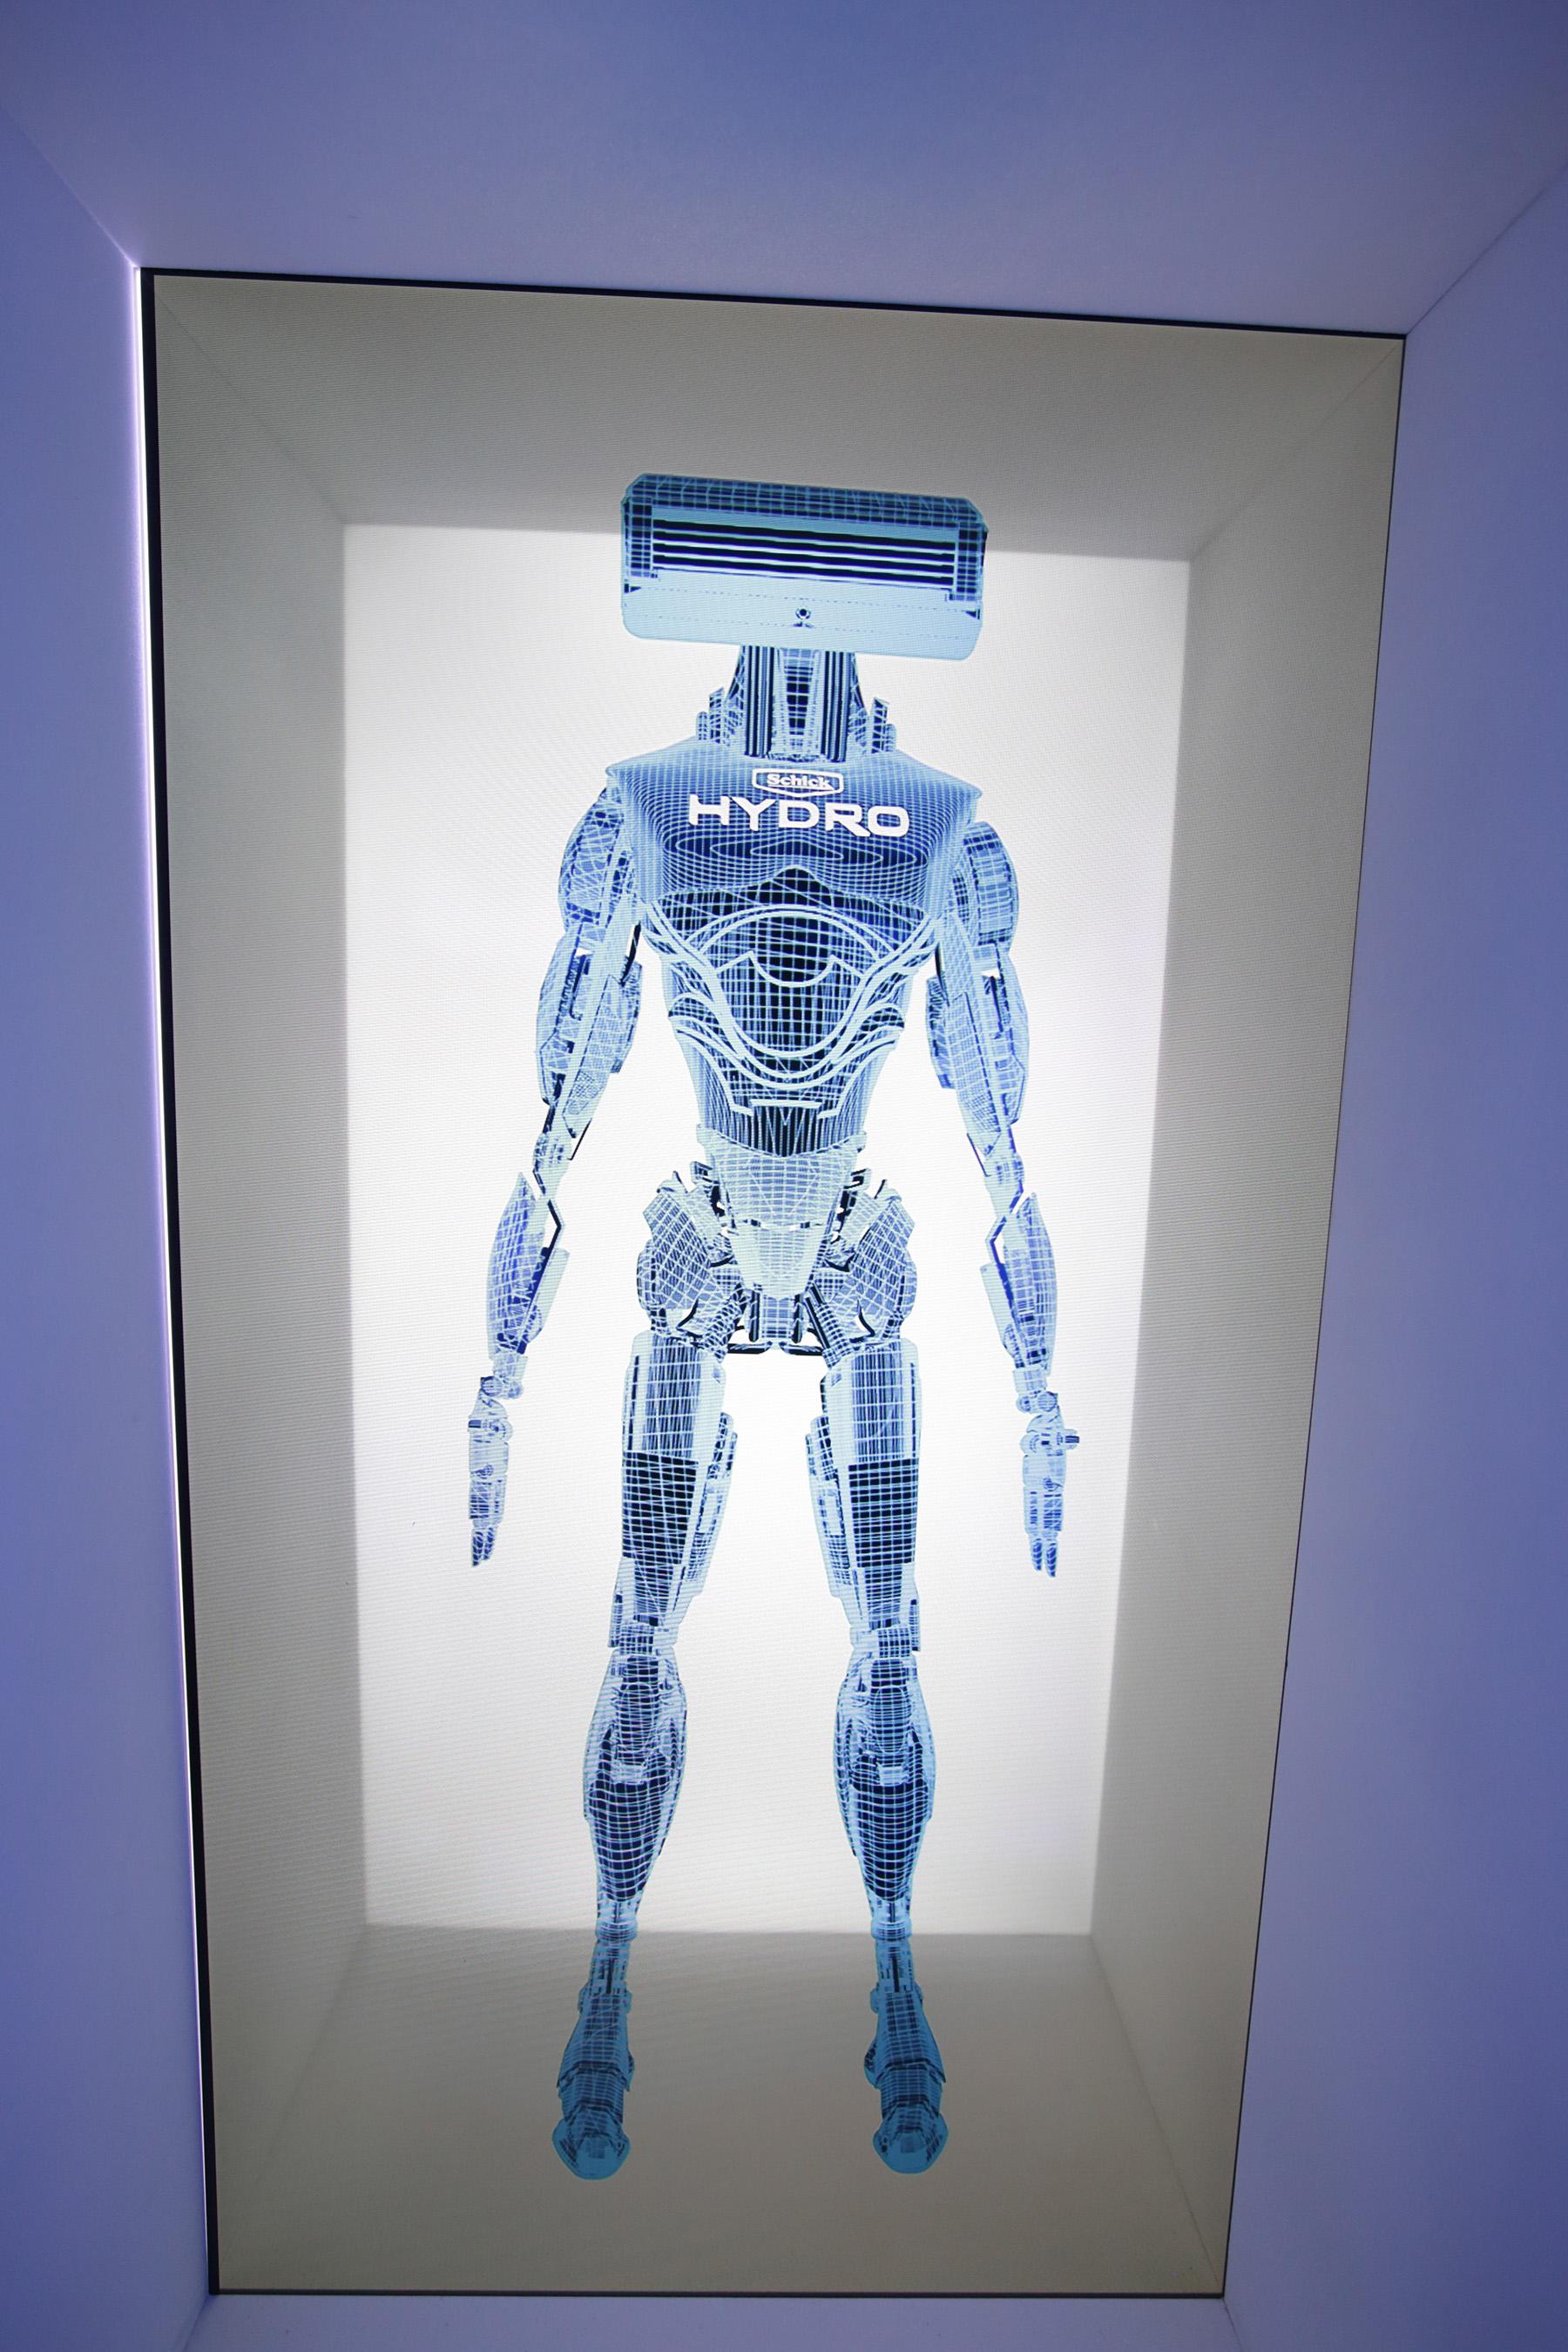 """Schick Hydro Escape"" Hydrobot Hologram"